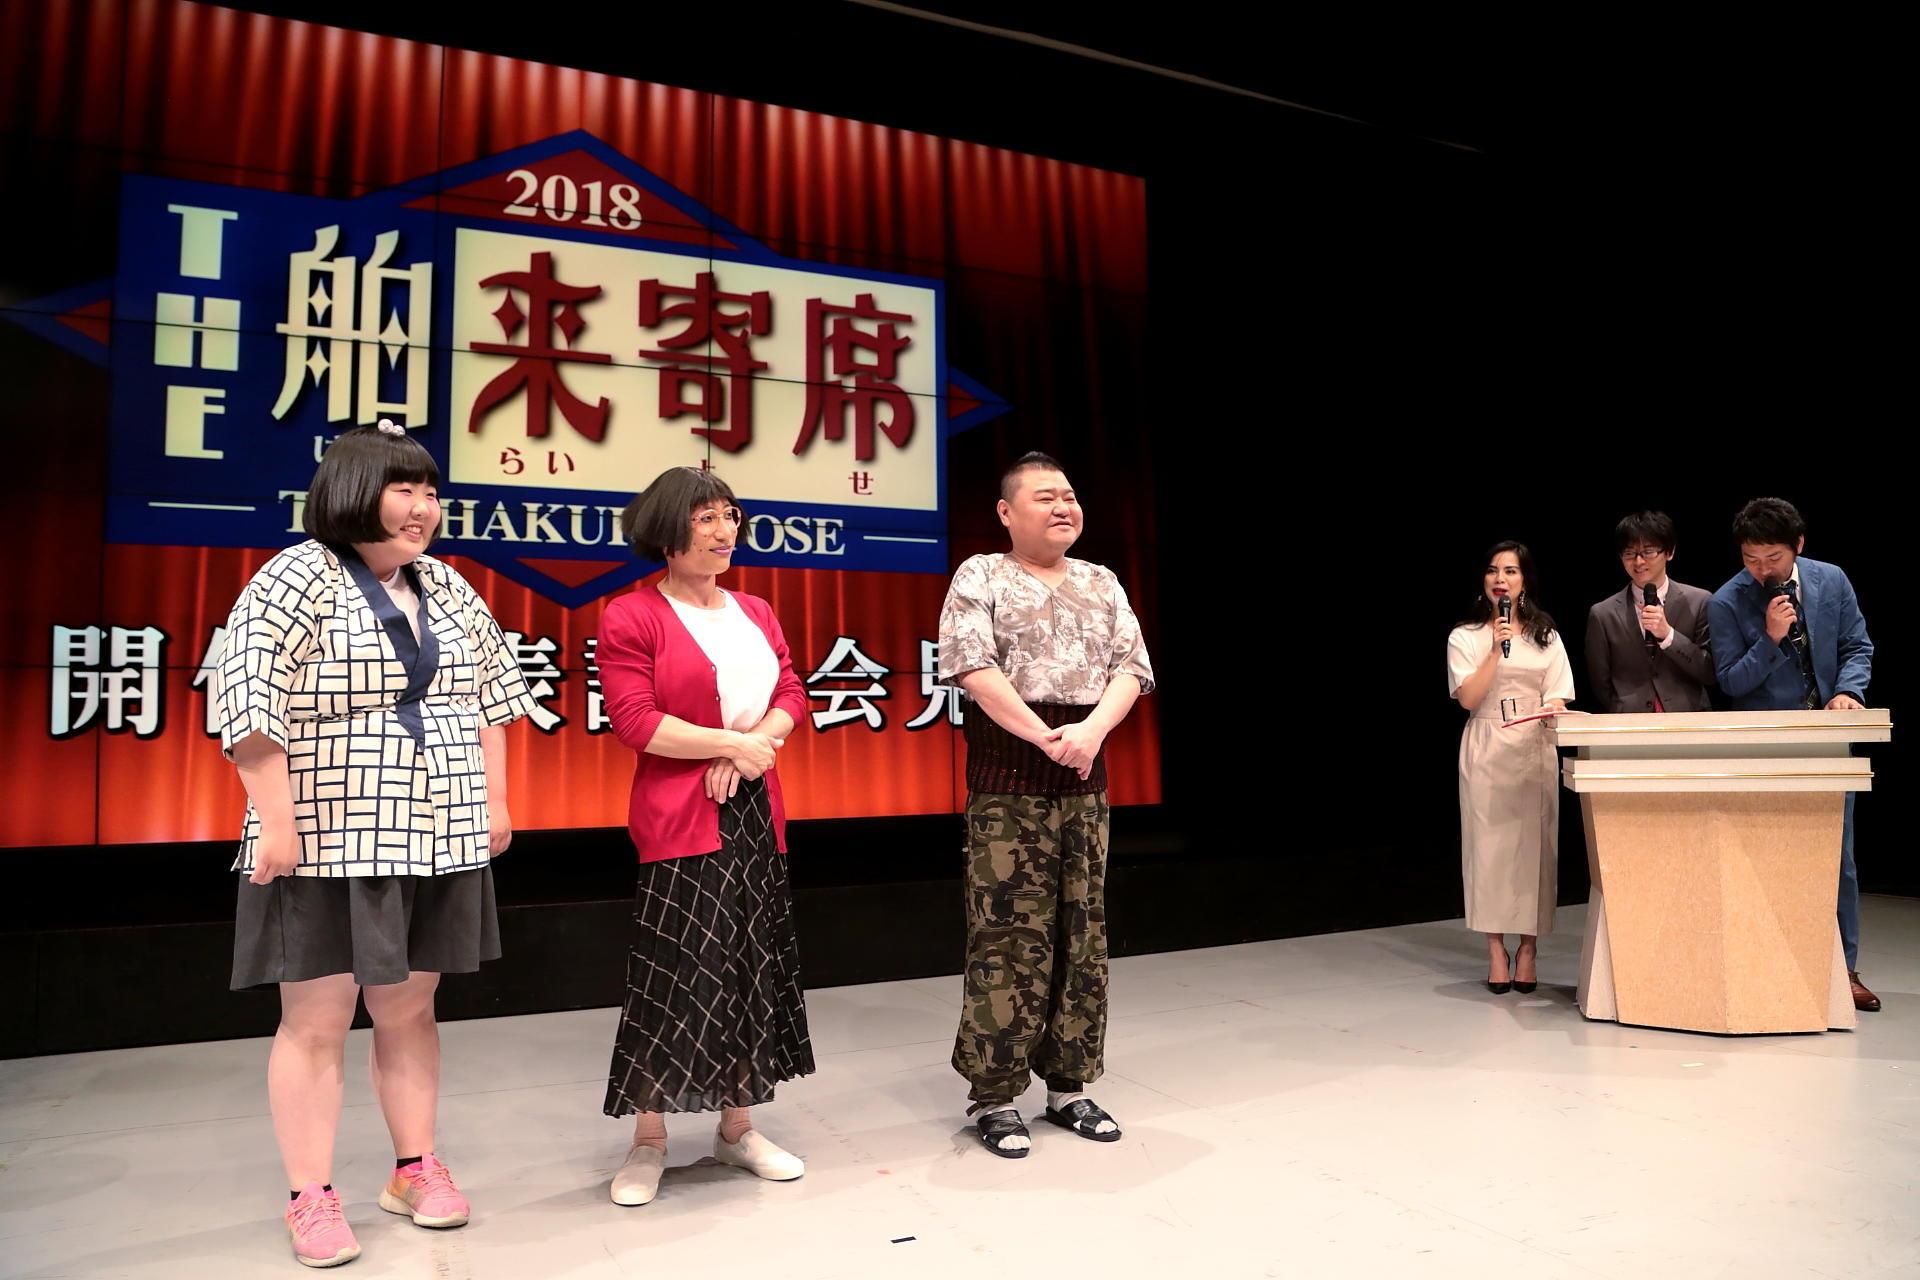 http://news.yoshimoto.co.jp/20180417124544-f057f118aa280988a8e1714aec4e9eca176b2ac0.jpg